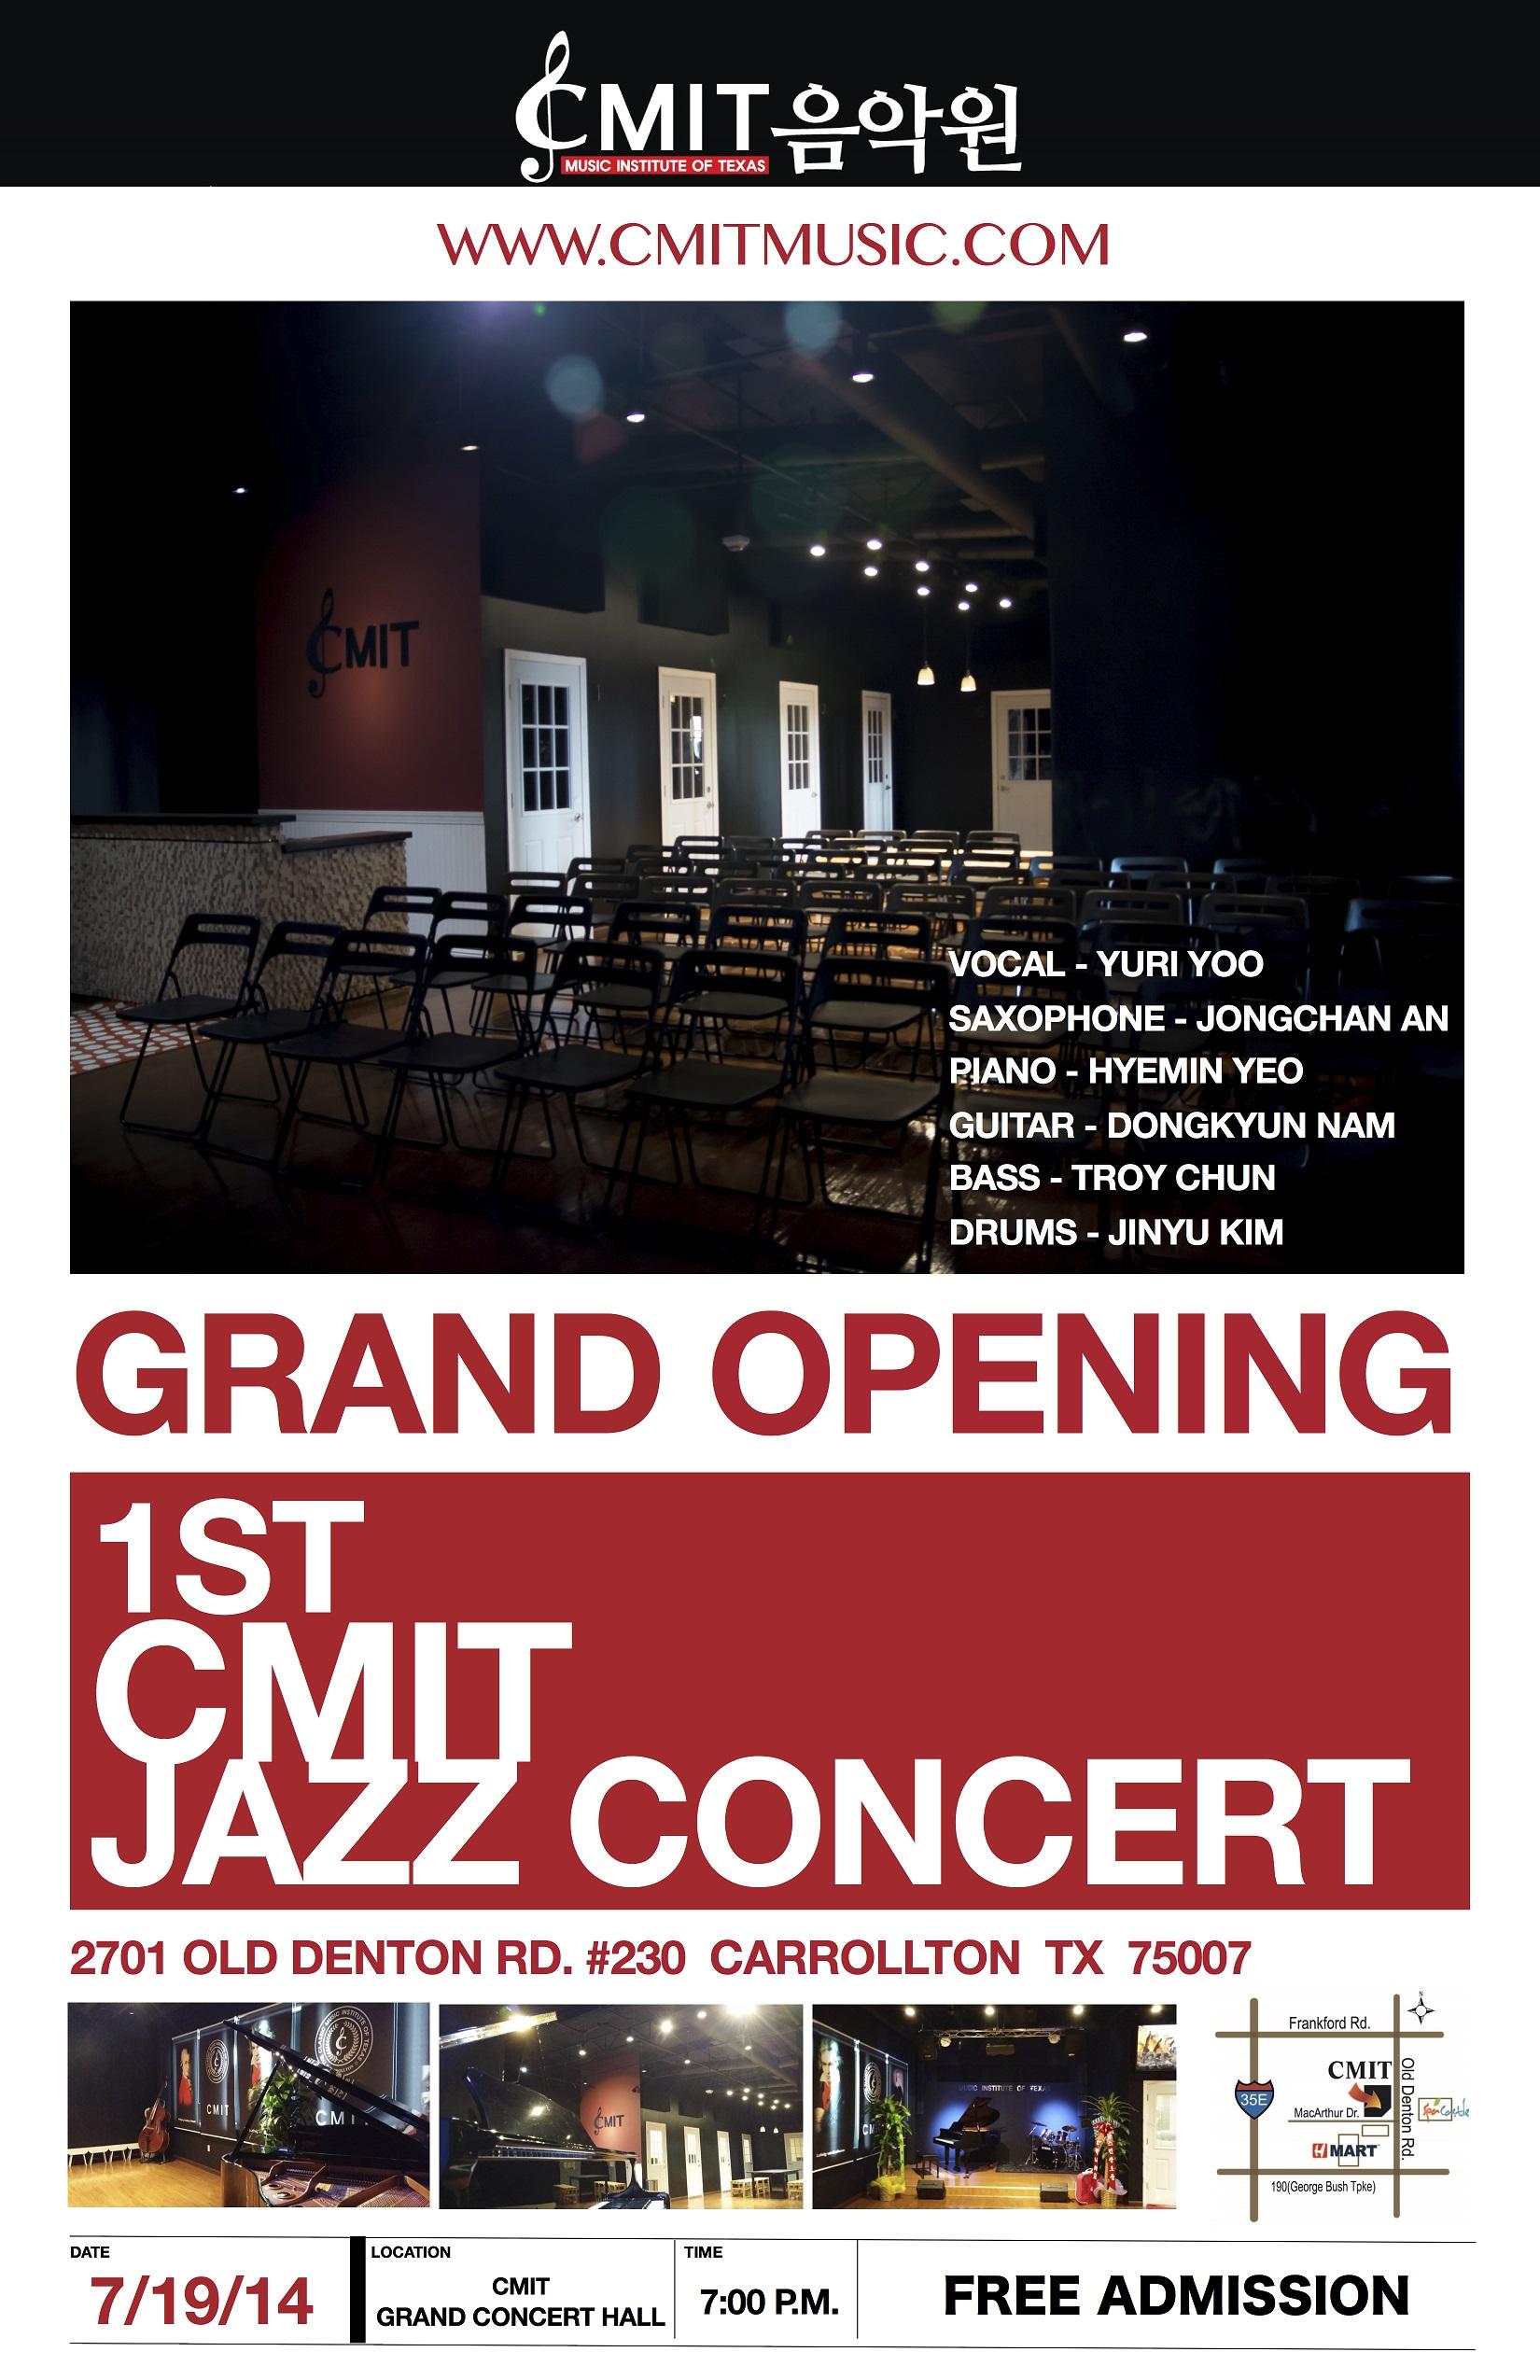 1st CMIT Jazz Concert Poster jpeg.jpg